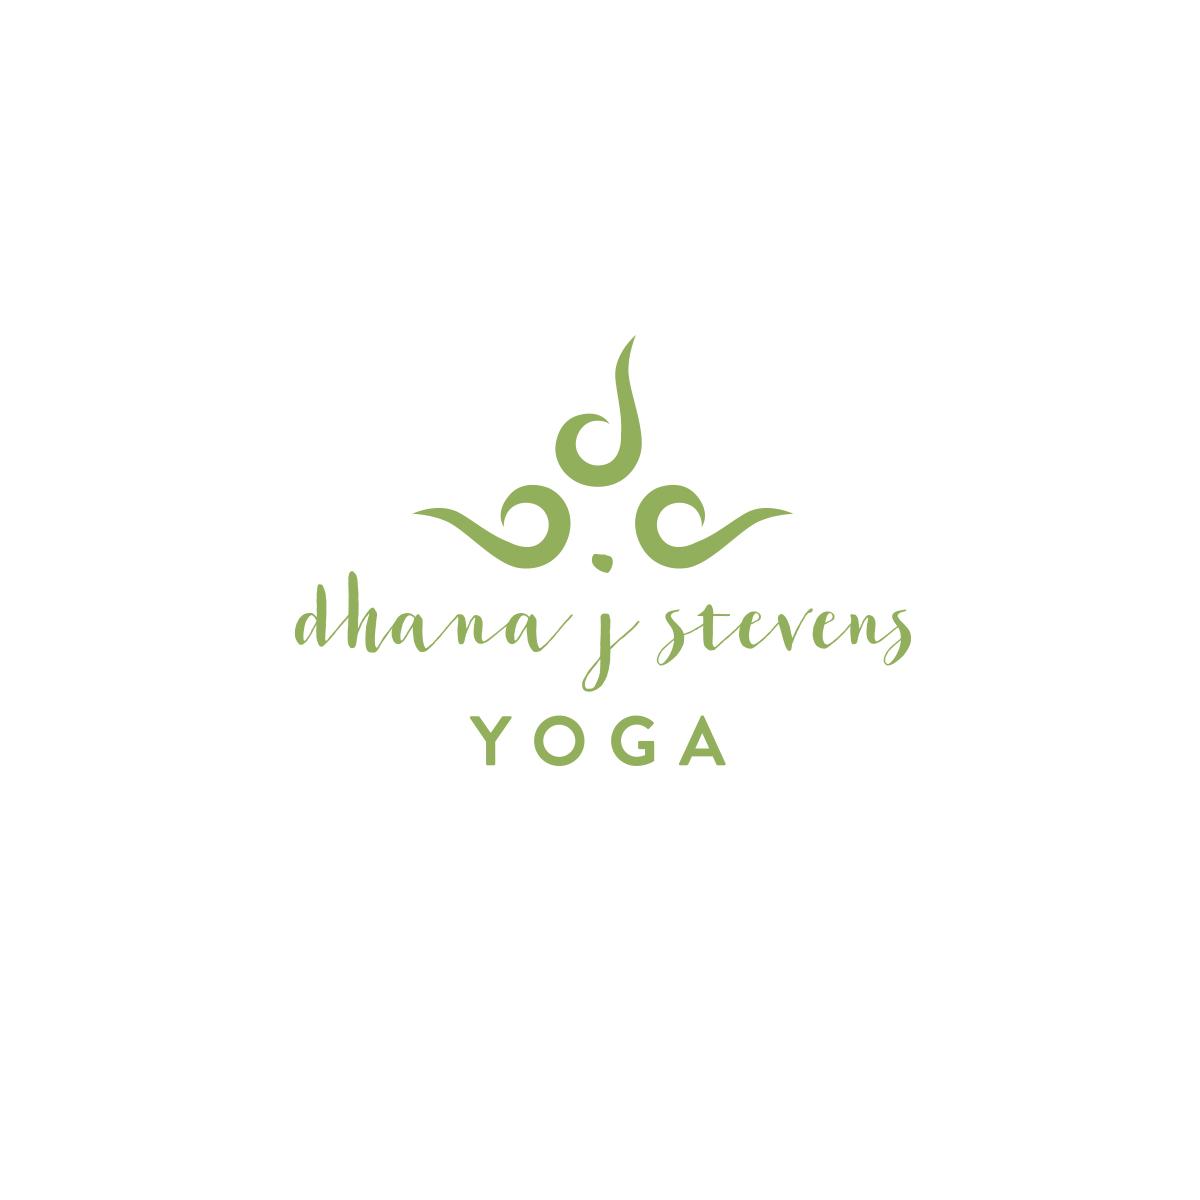 smudge-design-djs-yoga-logo.jpg